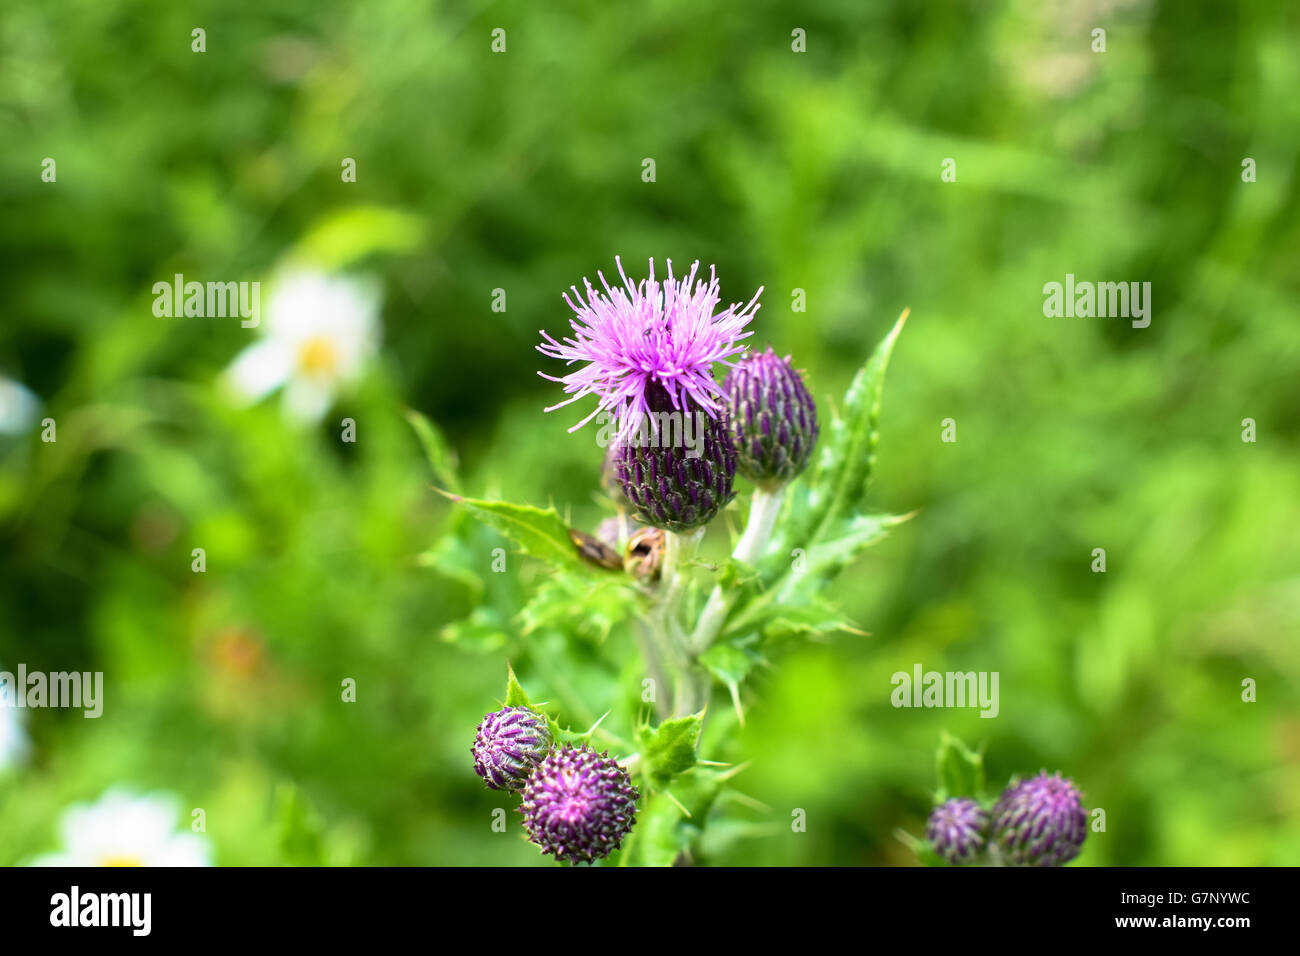 Purple thistle flower against green foilage, National symbol of Scotland - Stock Image